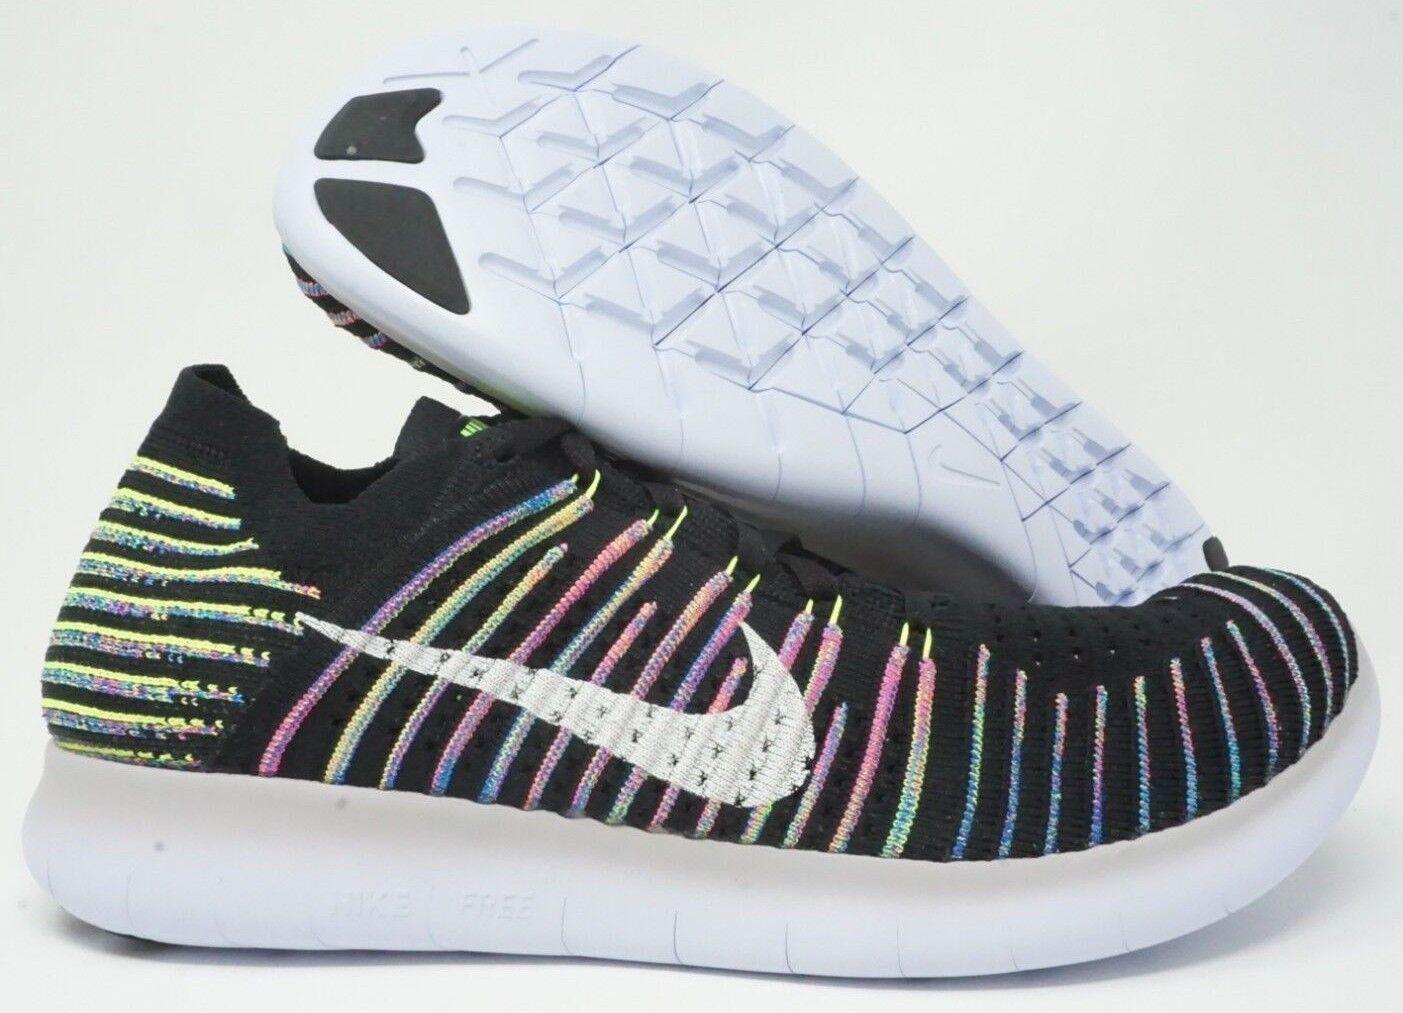 9182c1eeb232f Nike Free Flyknit Mens Running Shoes Black White Blue Size 10.5 Volt ...